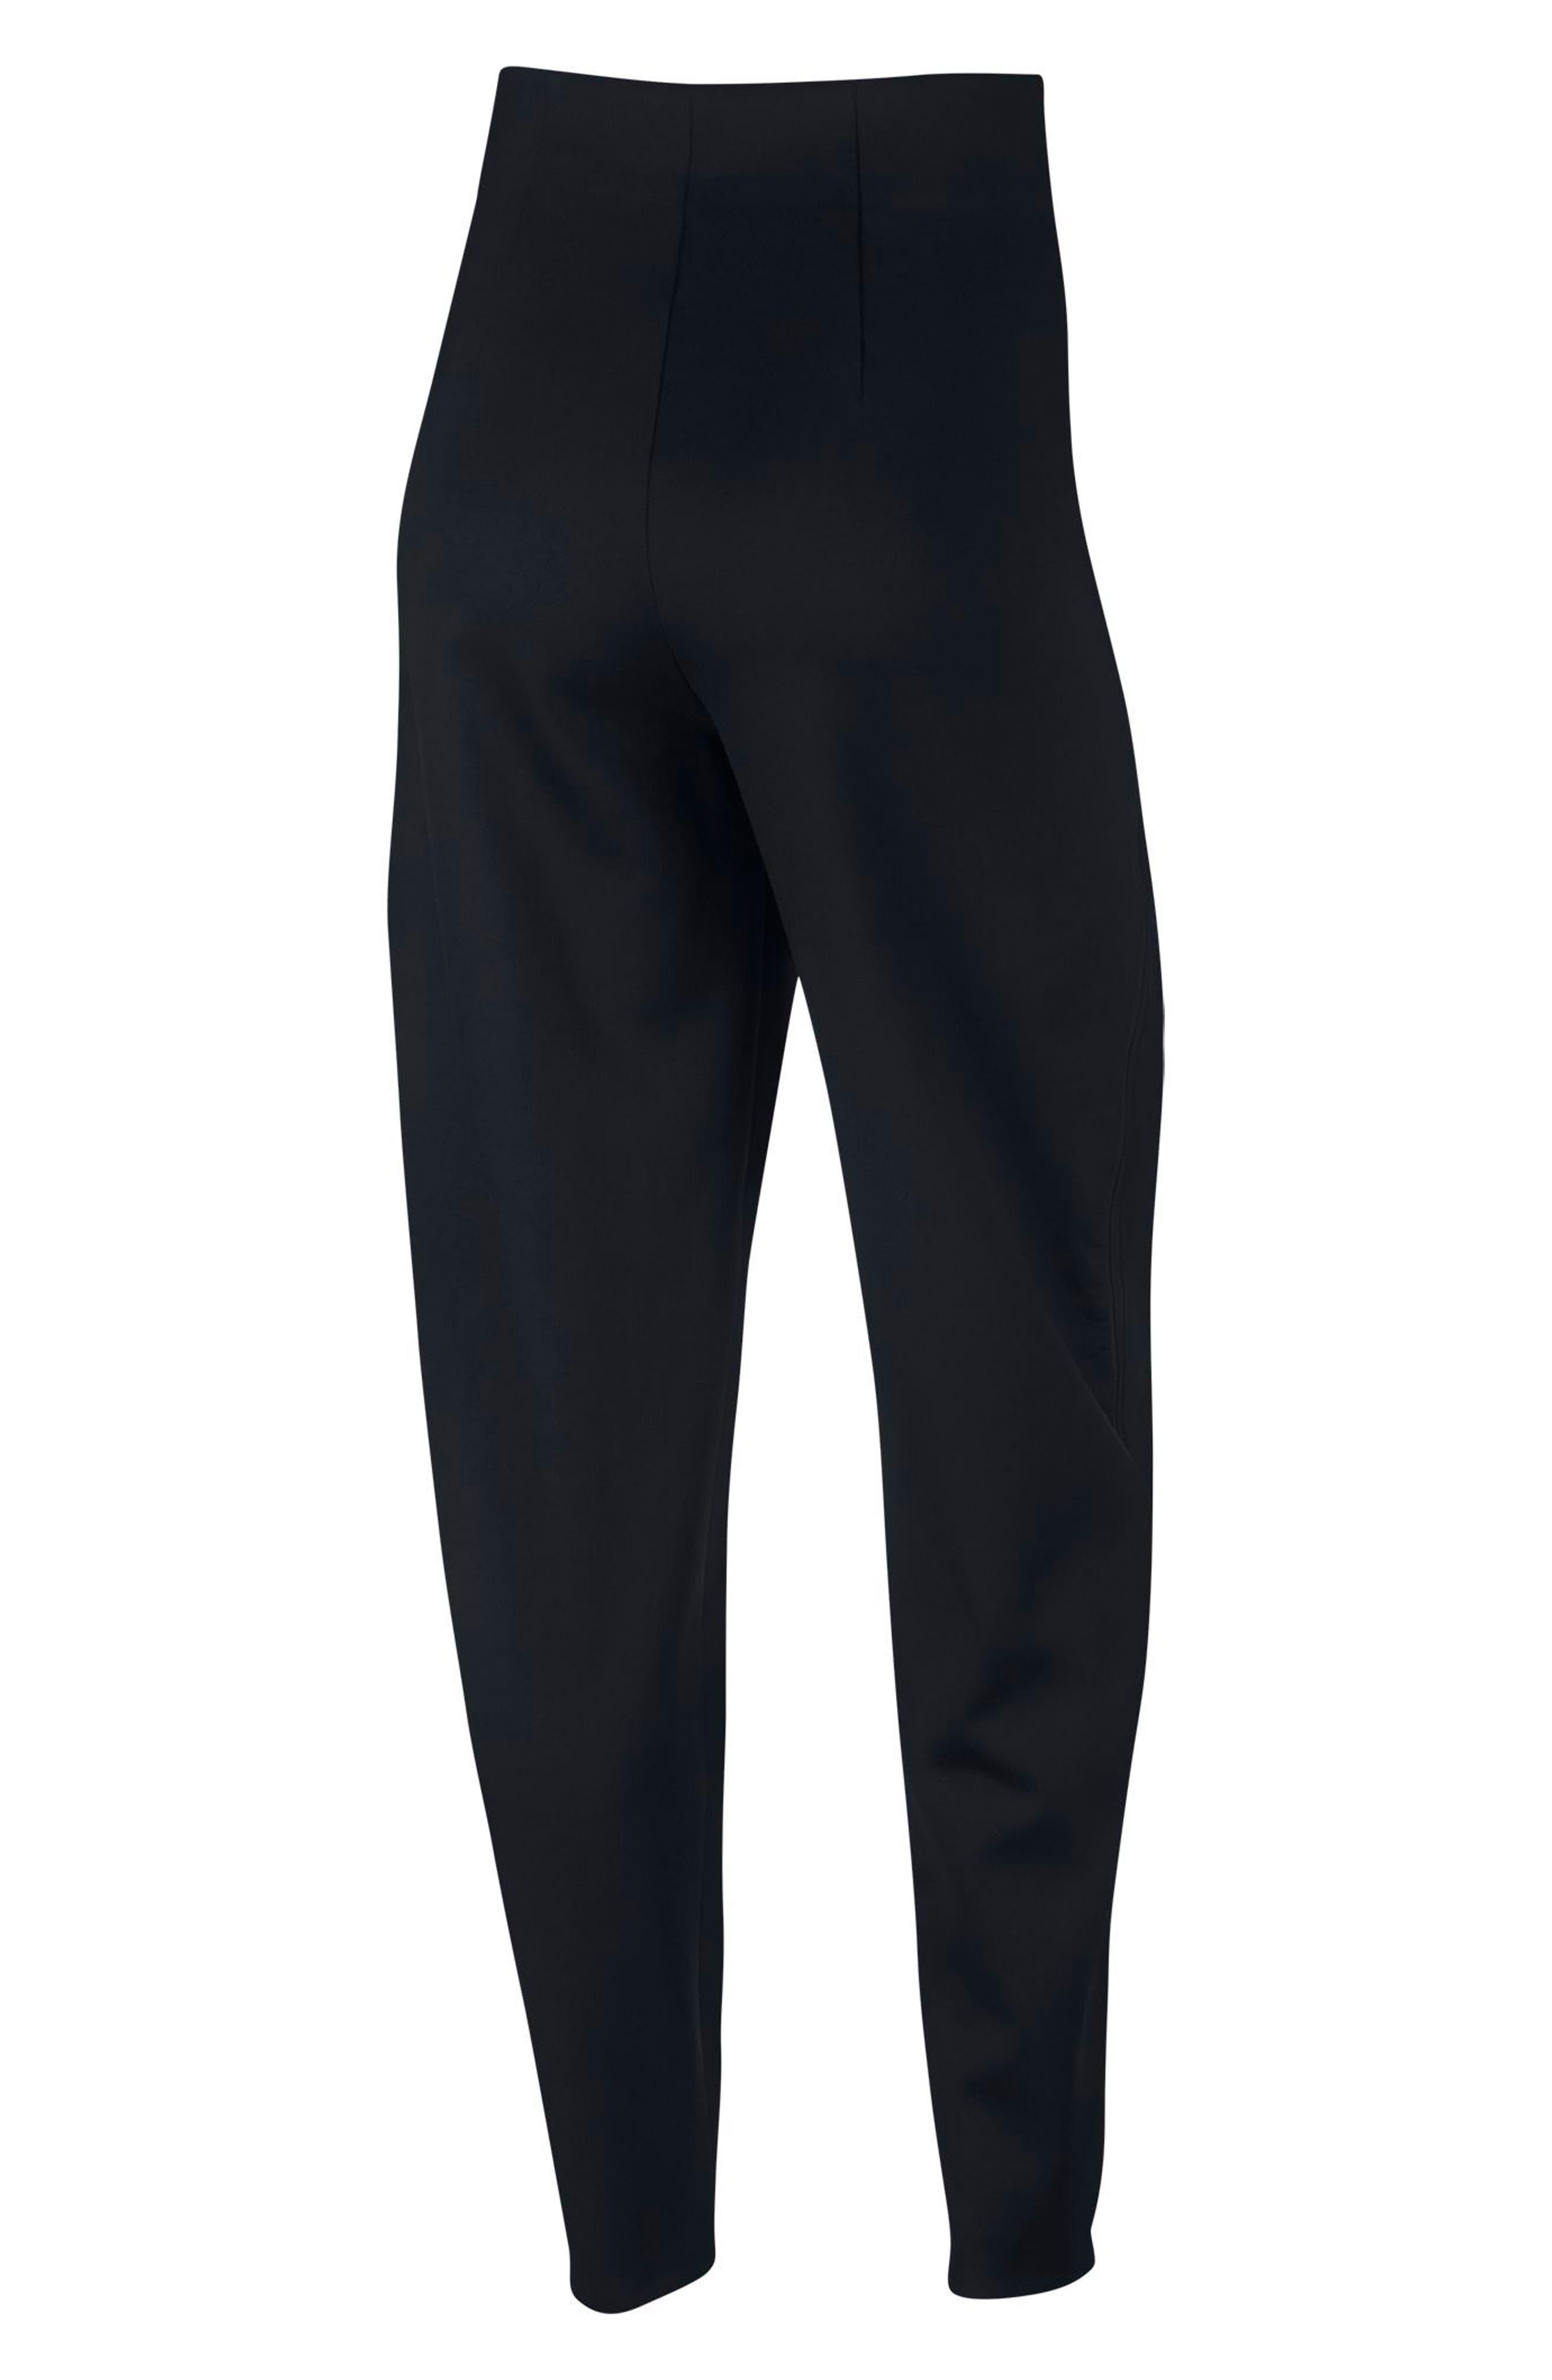 XX Project Women's Dri-FIT Training Pants,                             Alternate thumbnail 7, color,                             BLACK